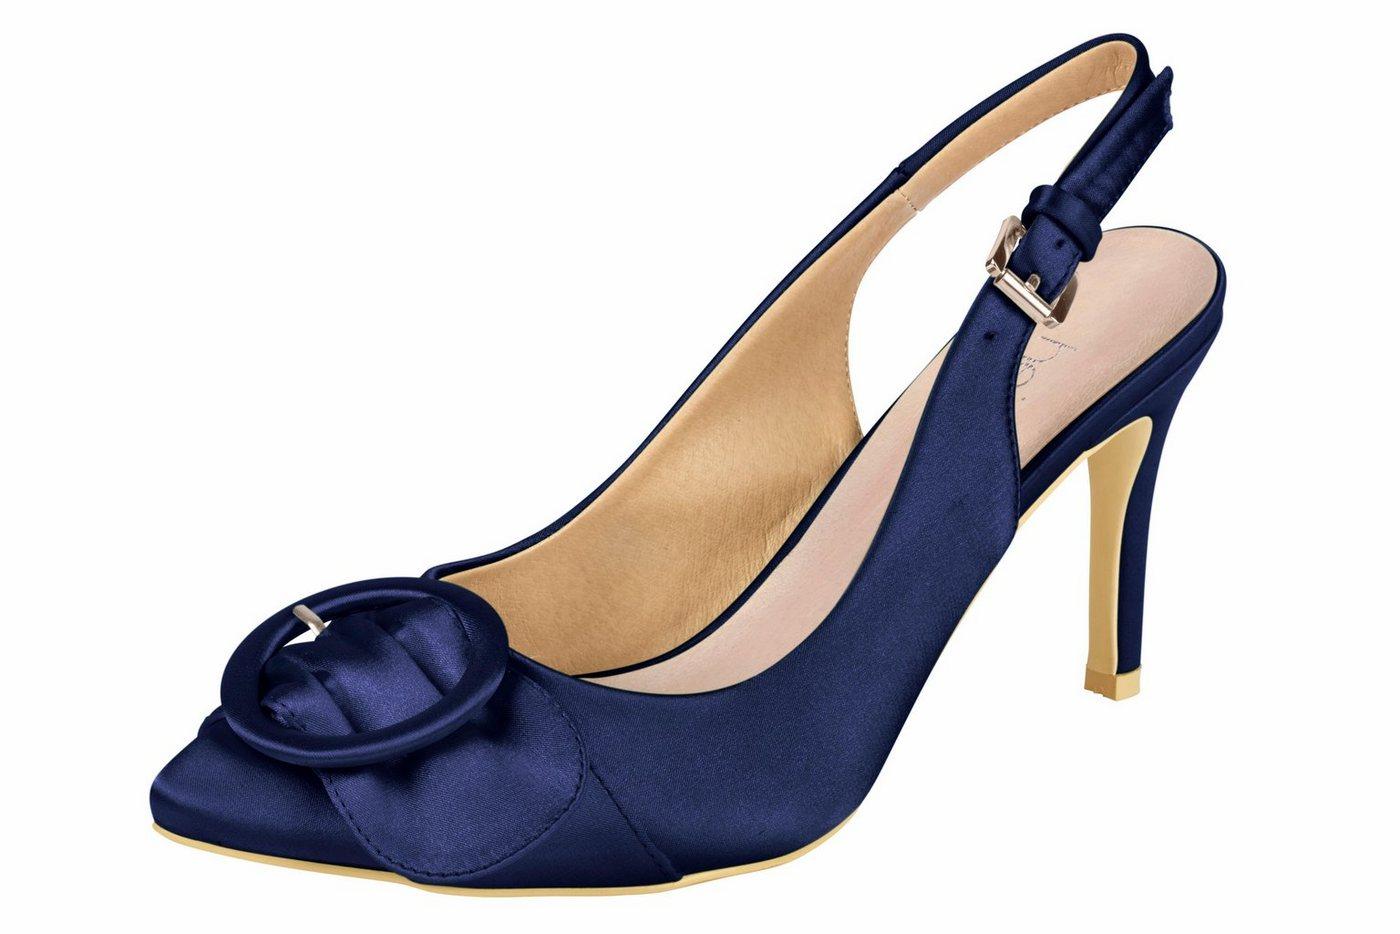 Heine Slingpumps aus Satinware | Schuhe > Pumps > Slingpumps | Blau | Ca | heine